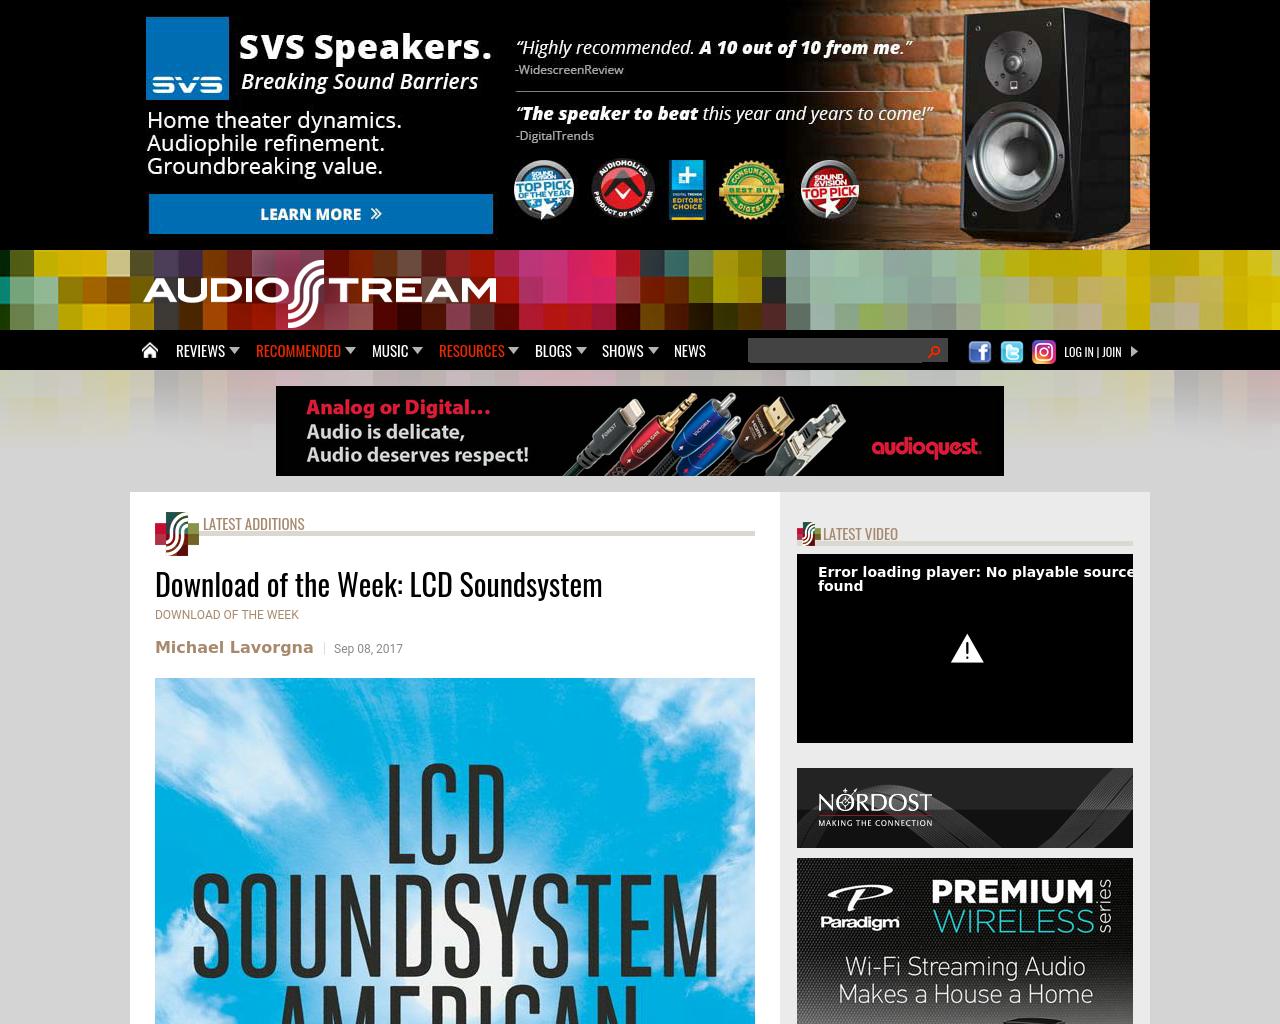 AUDIO-STREAM-Advertising-Reviews-Pricing